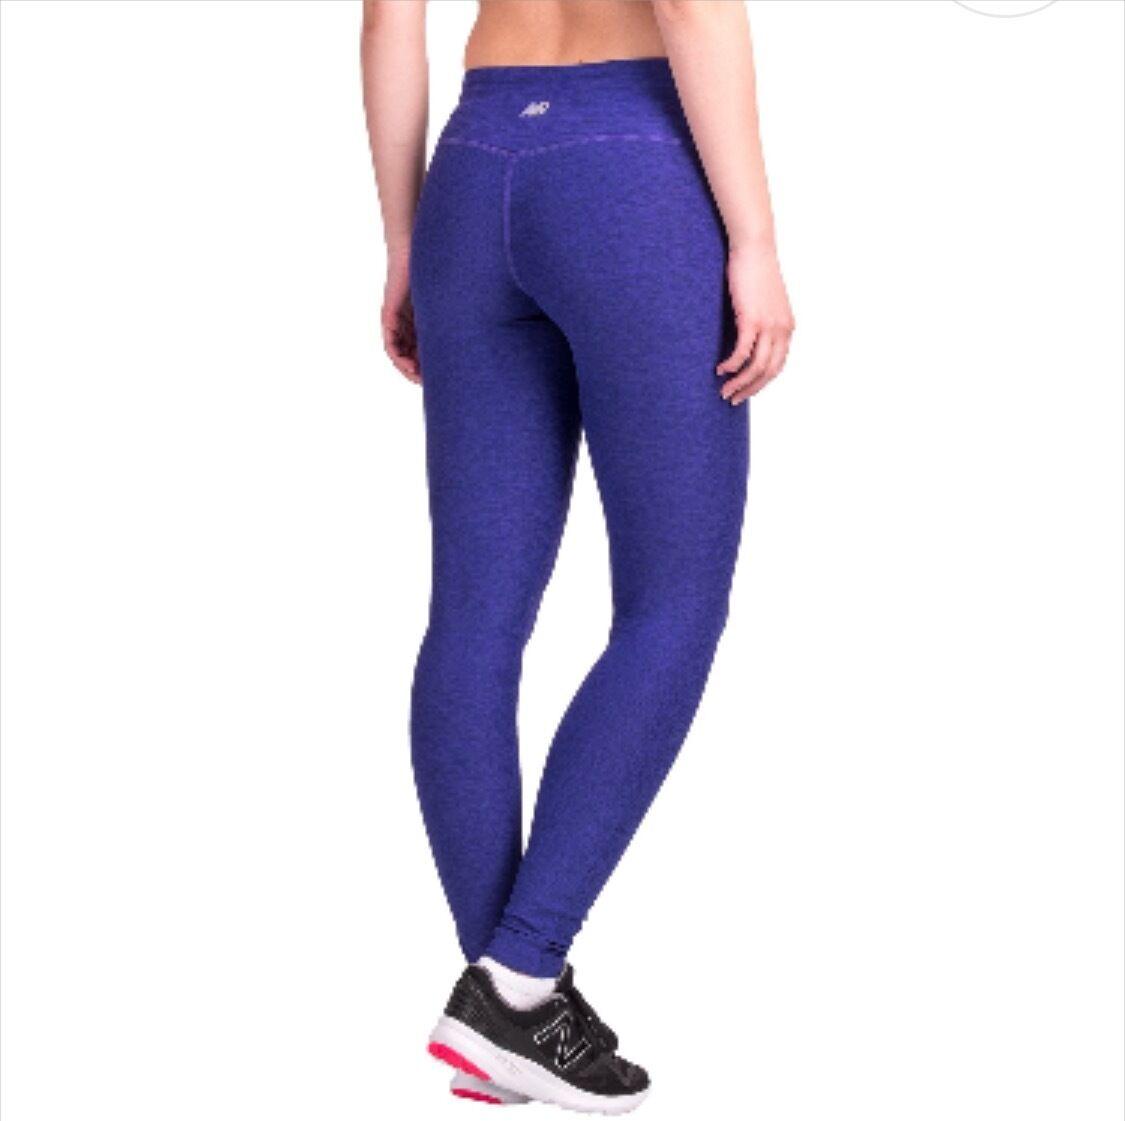 NWT Women's New Balance Athletic Yoga Space Dye Leggings Purple XS S L XL